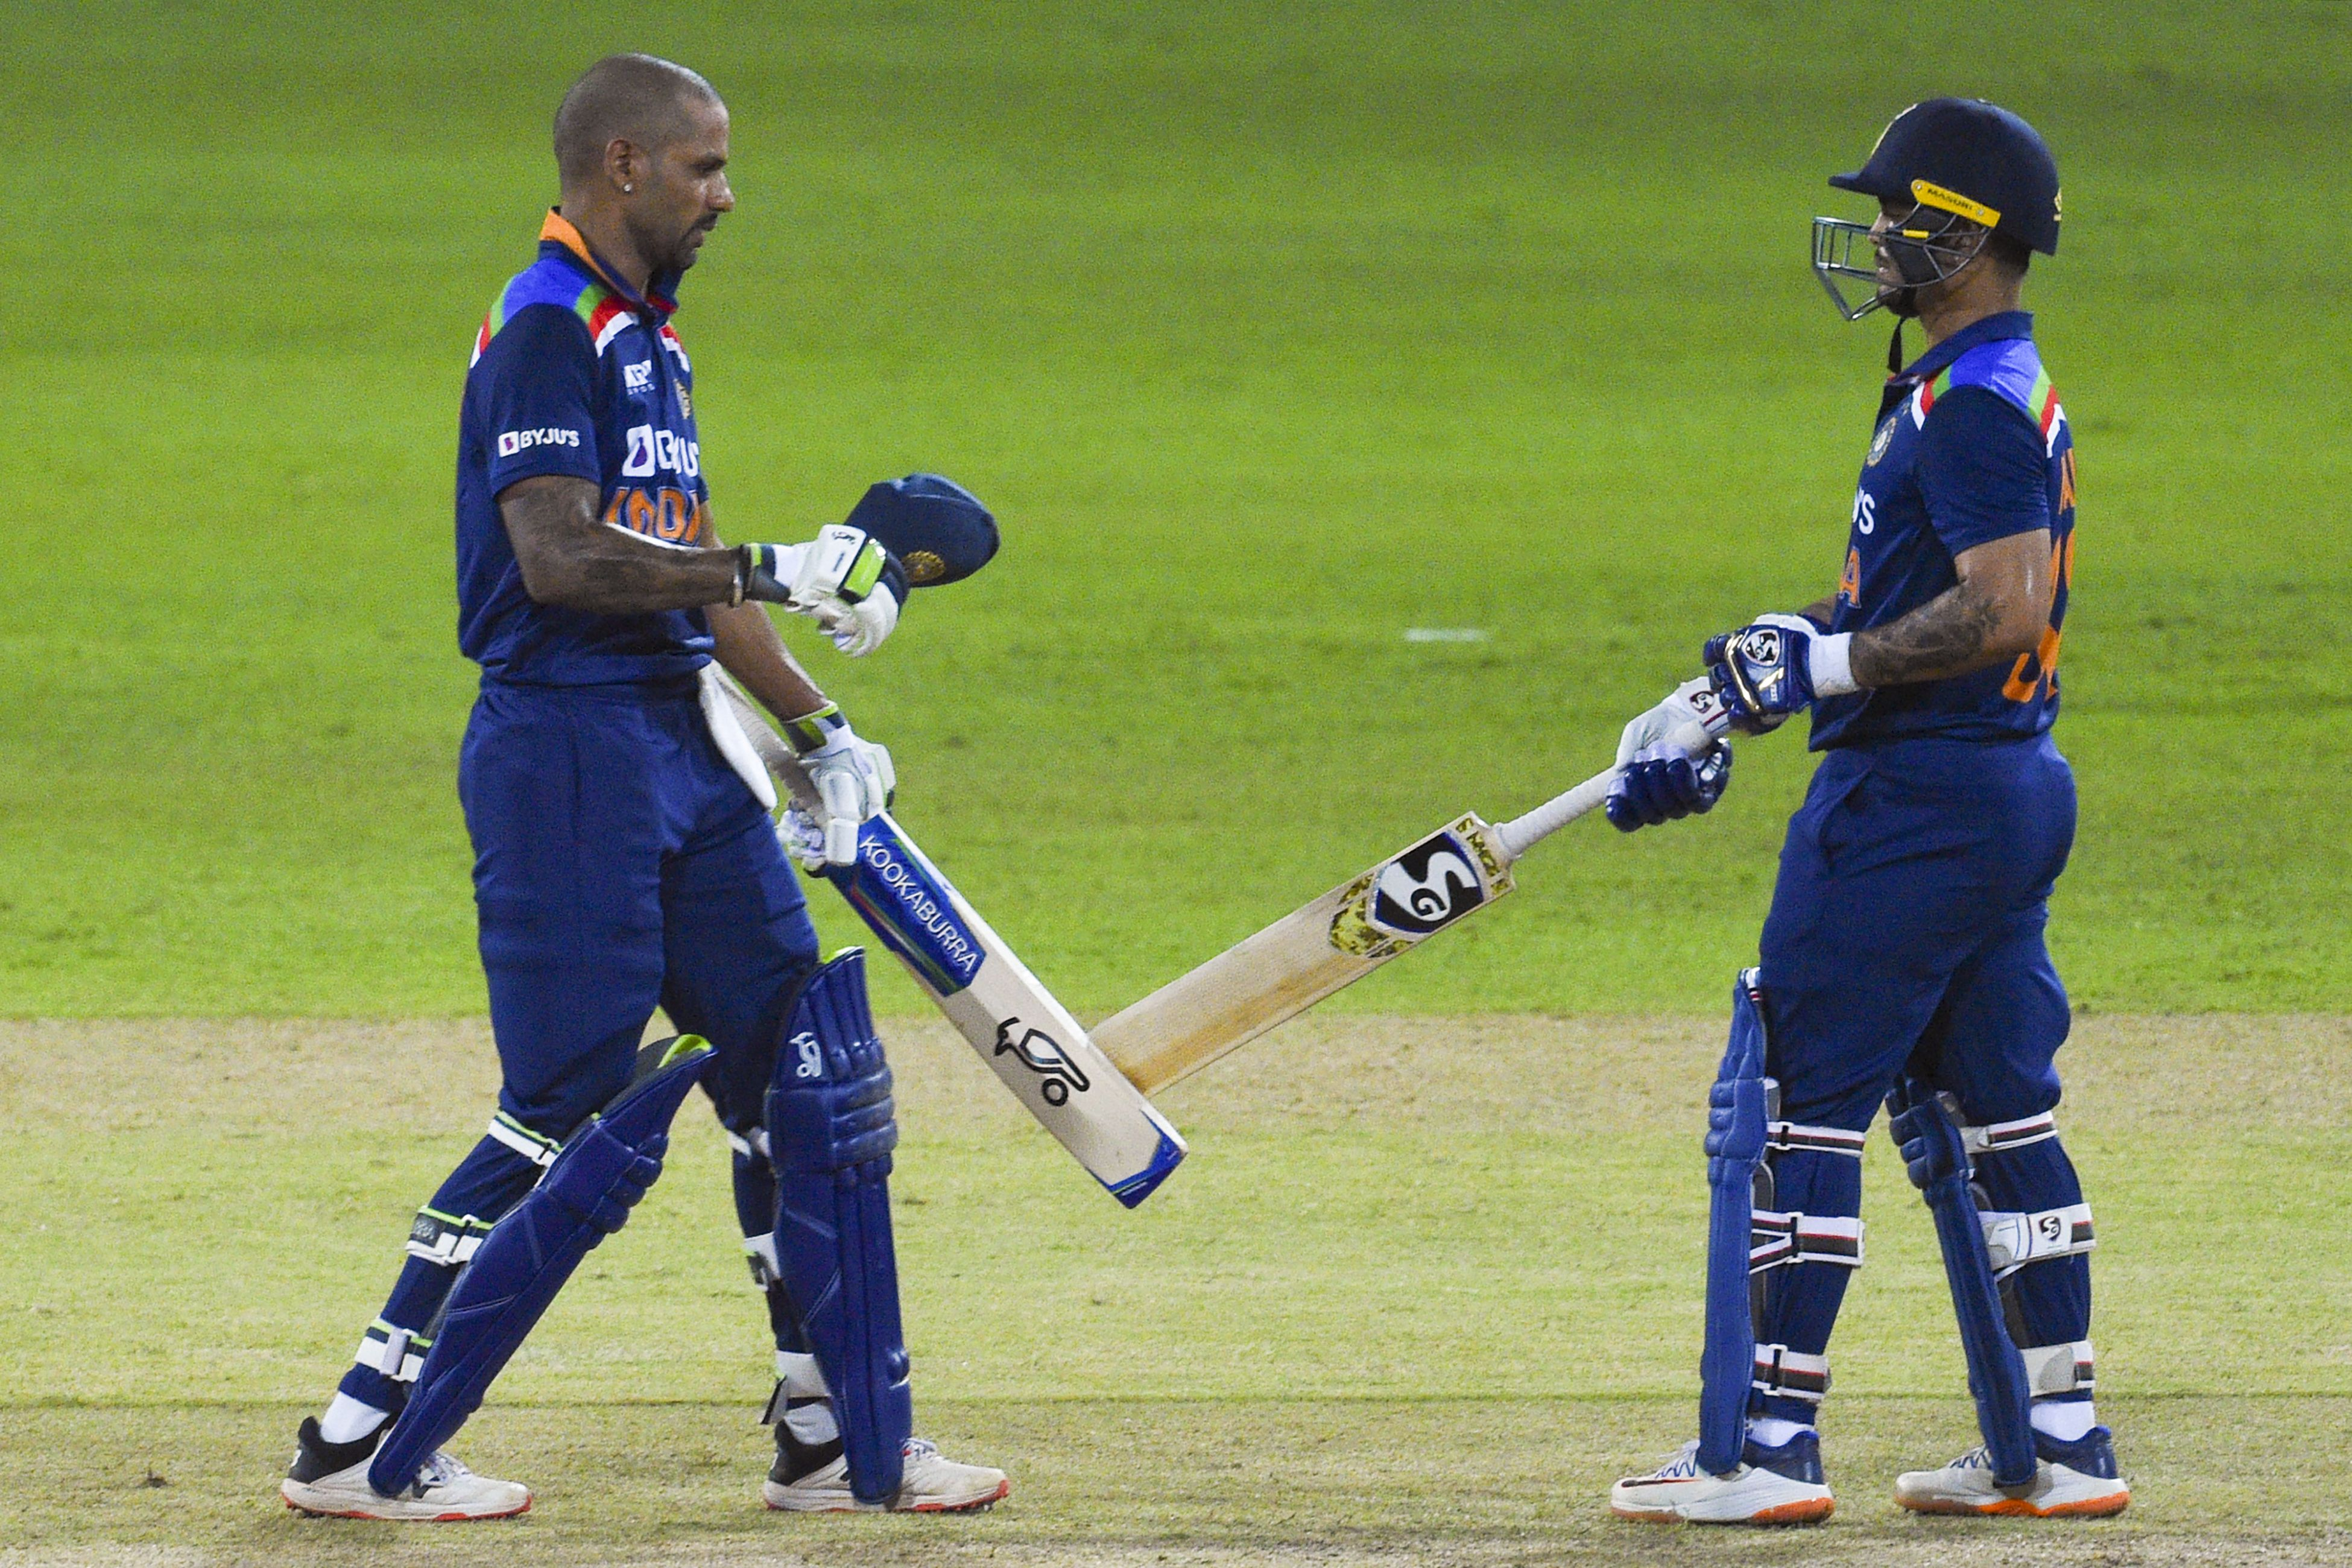 Shikhar Dhawan (left) and Ishan Kishan shared an 85-run stand off only 74 balls // Getty